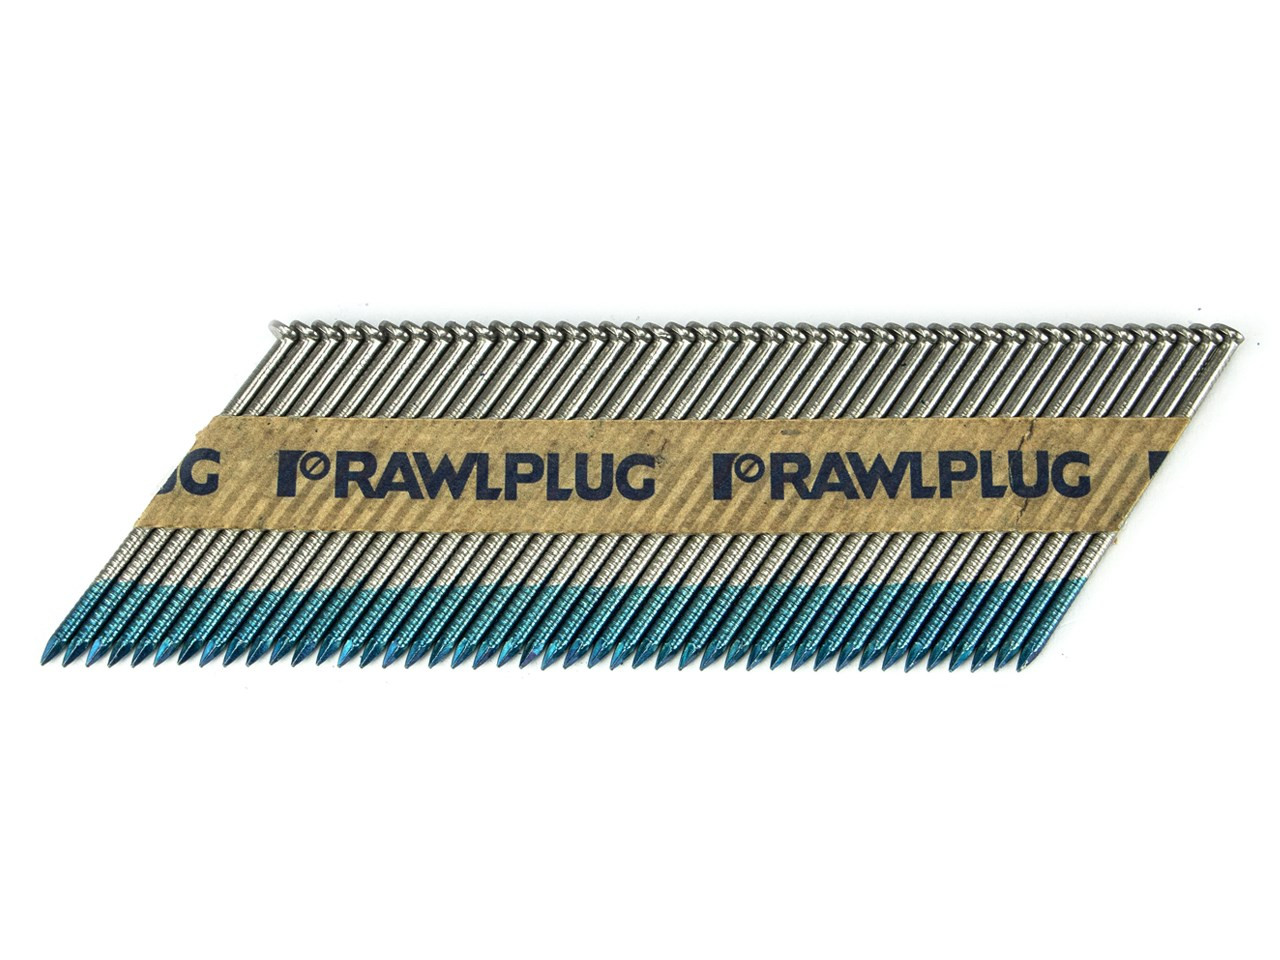 2.8 x 63 Rawlplug Bright Ring Nails (Box 3300 & 3 Fuel Cells)